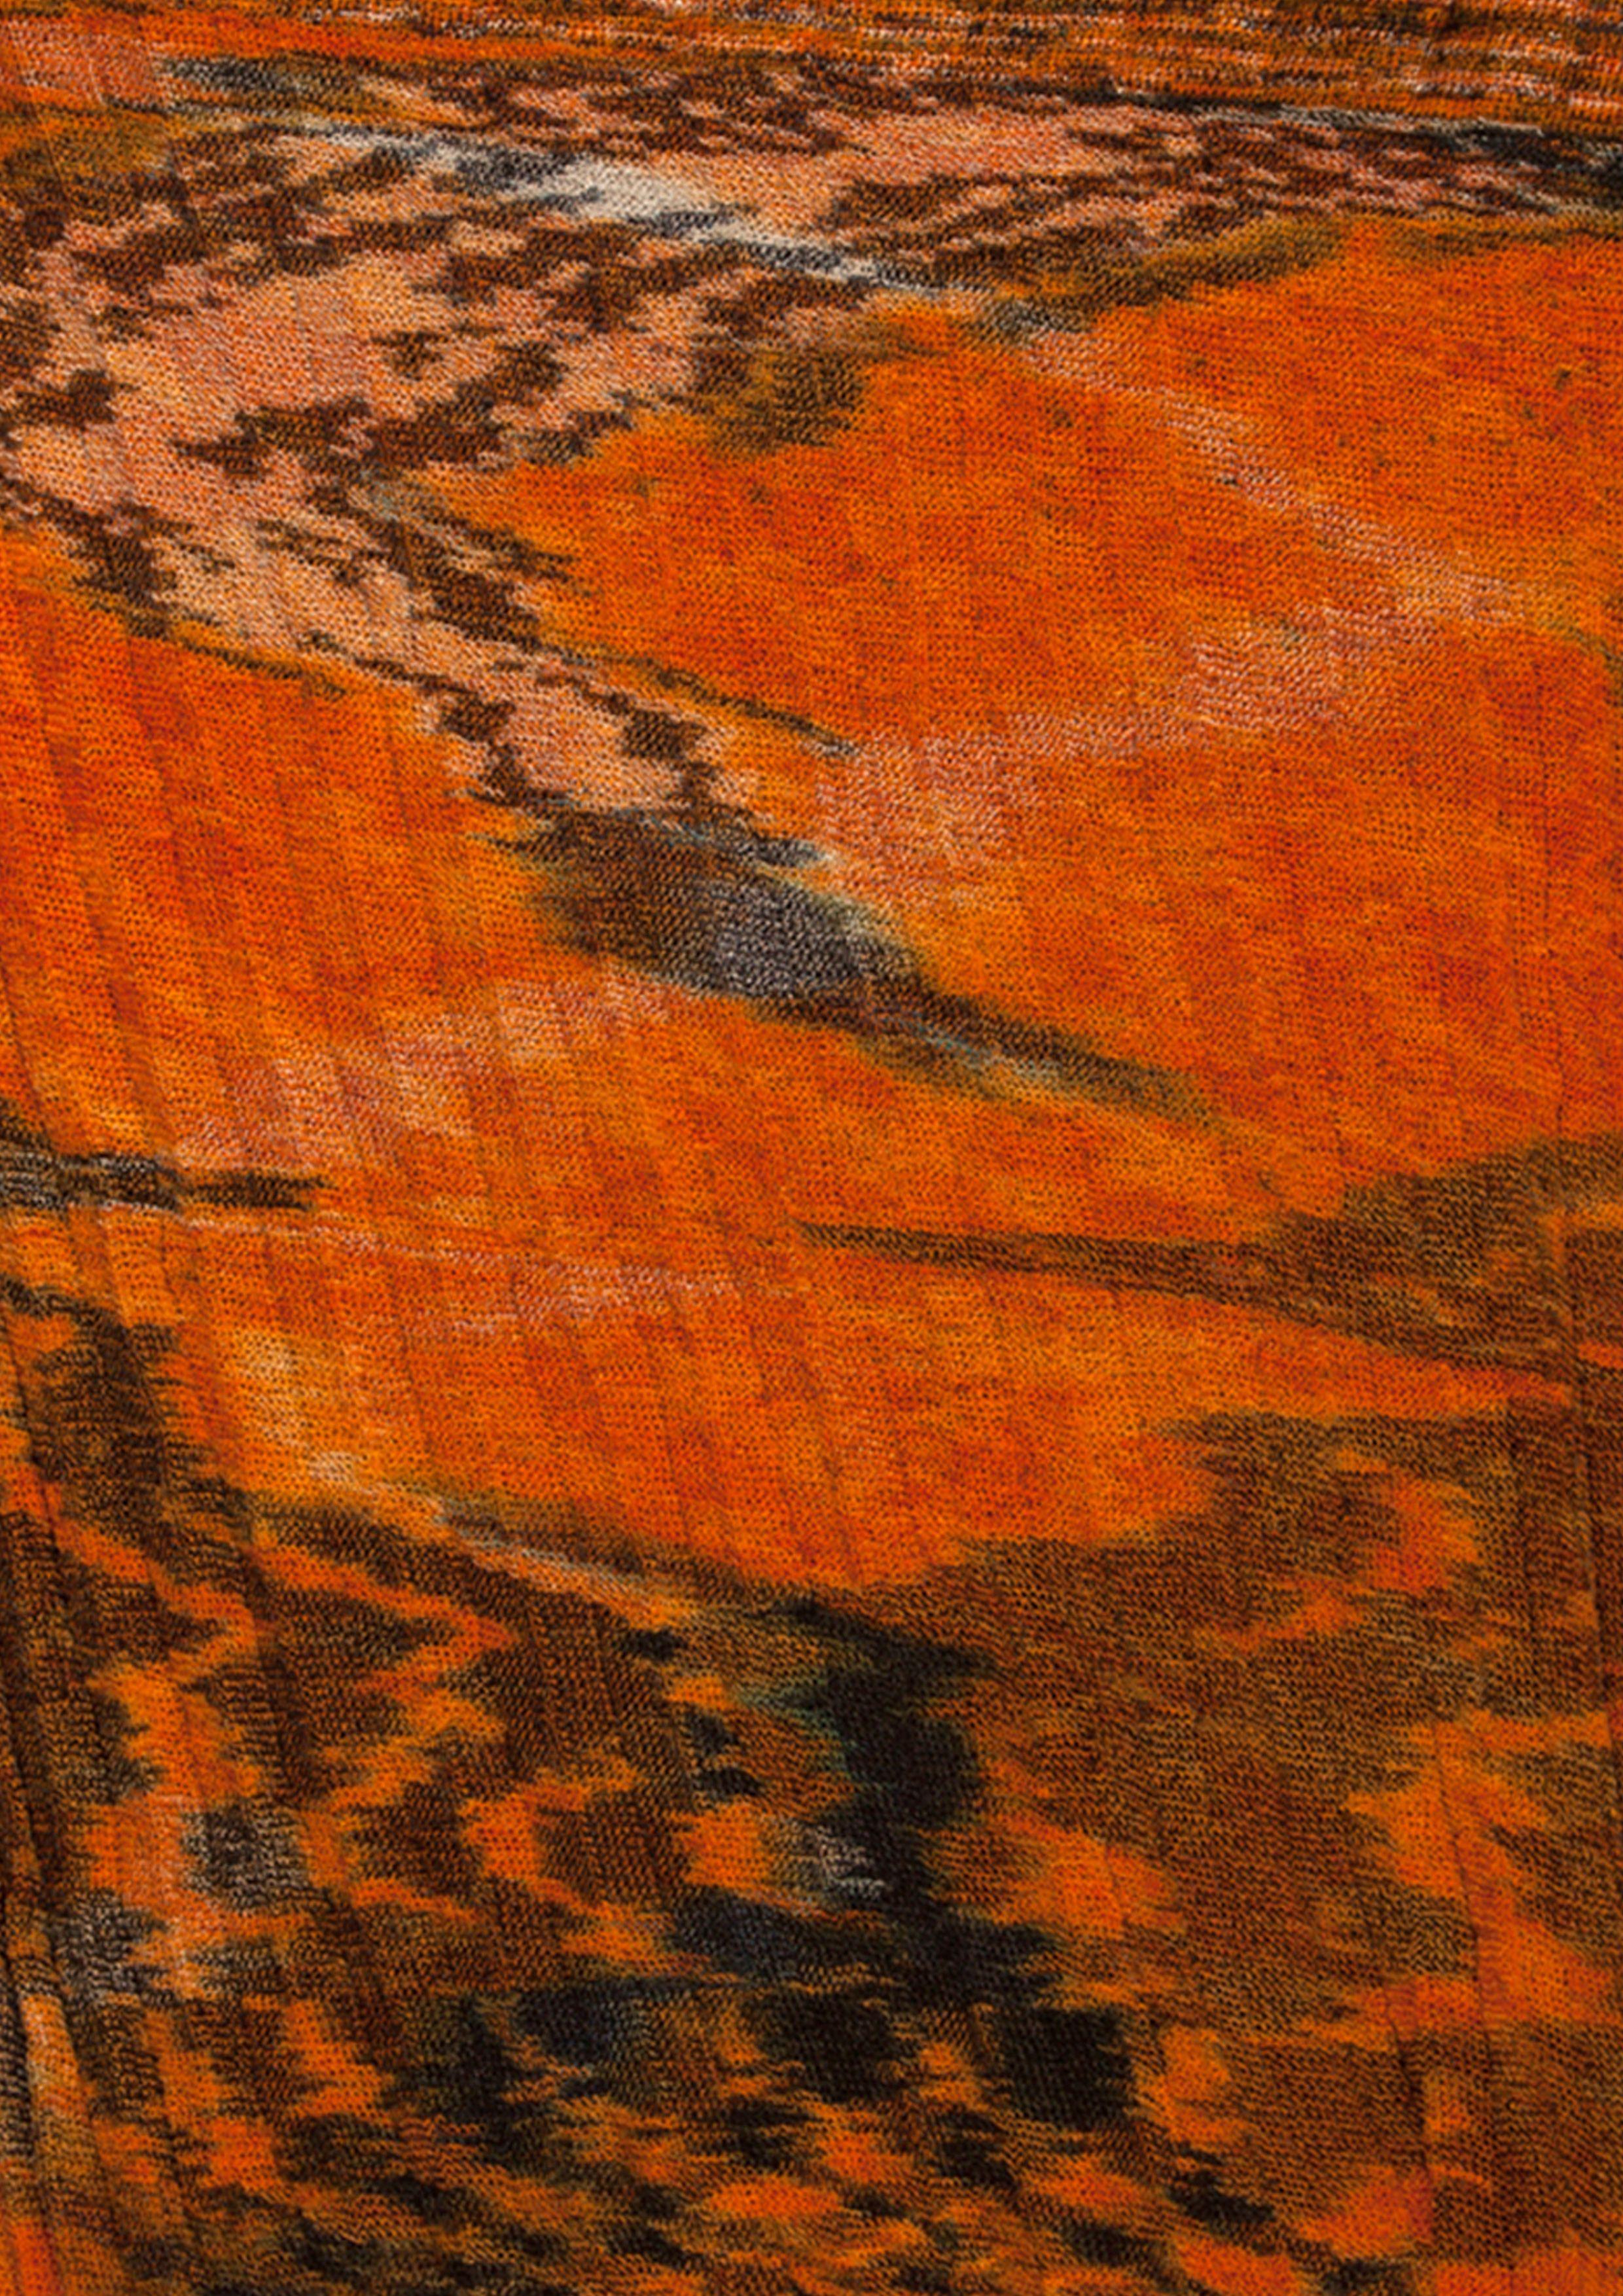 Sarah_Wendler - Animalie - Textile_Design - Graduat Textile Collection - knit - ikat